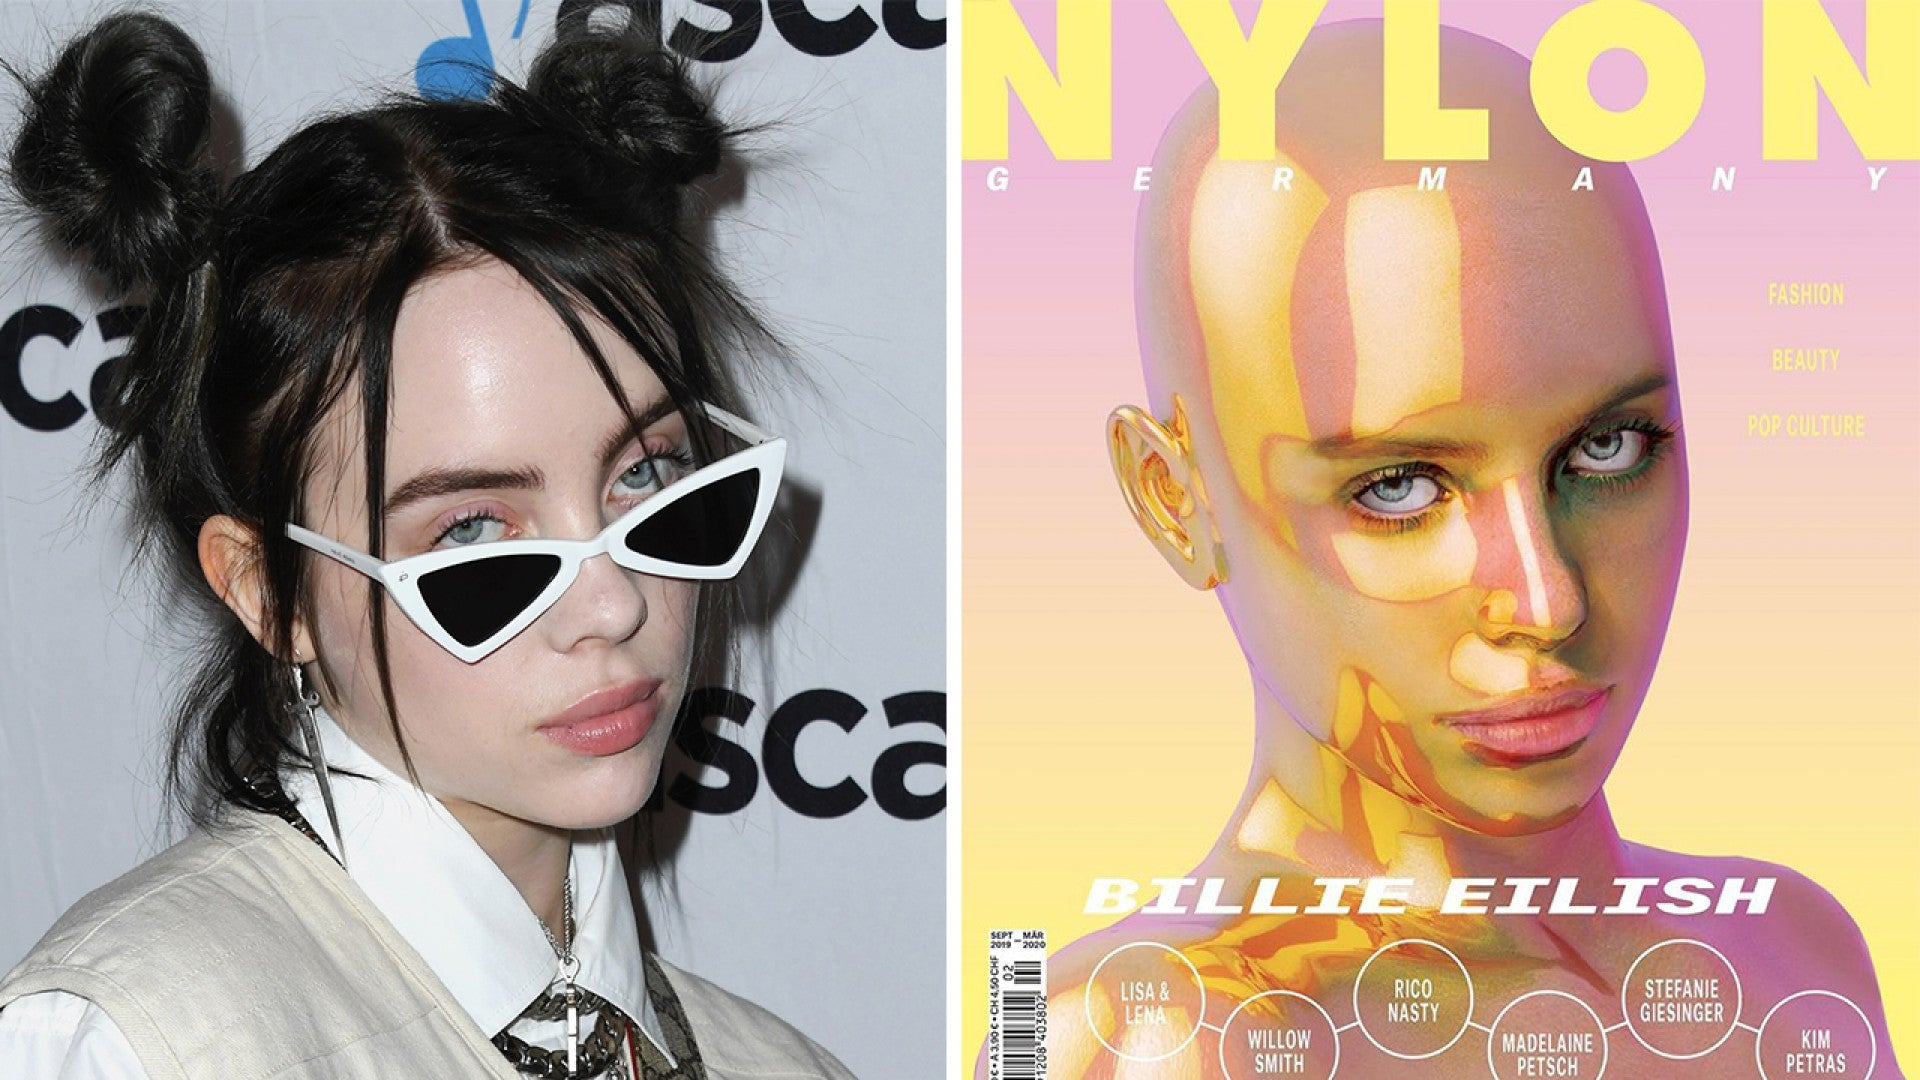 Billie Eilish Nude billie eilish slams magazine for using her image on the